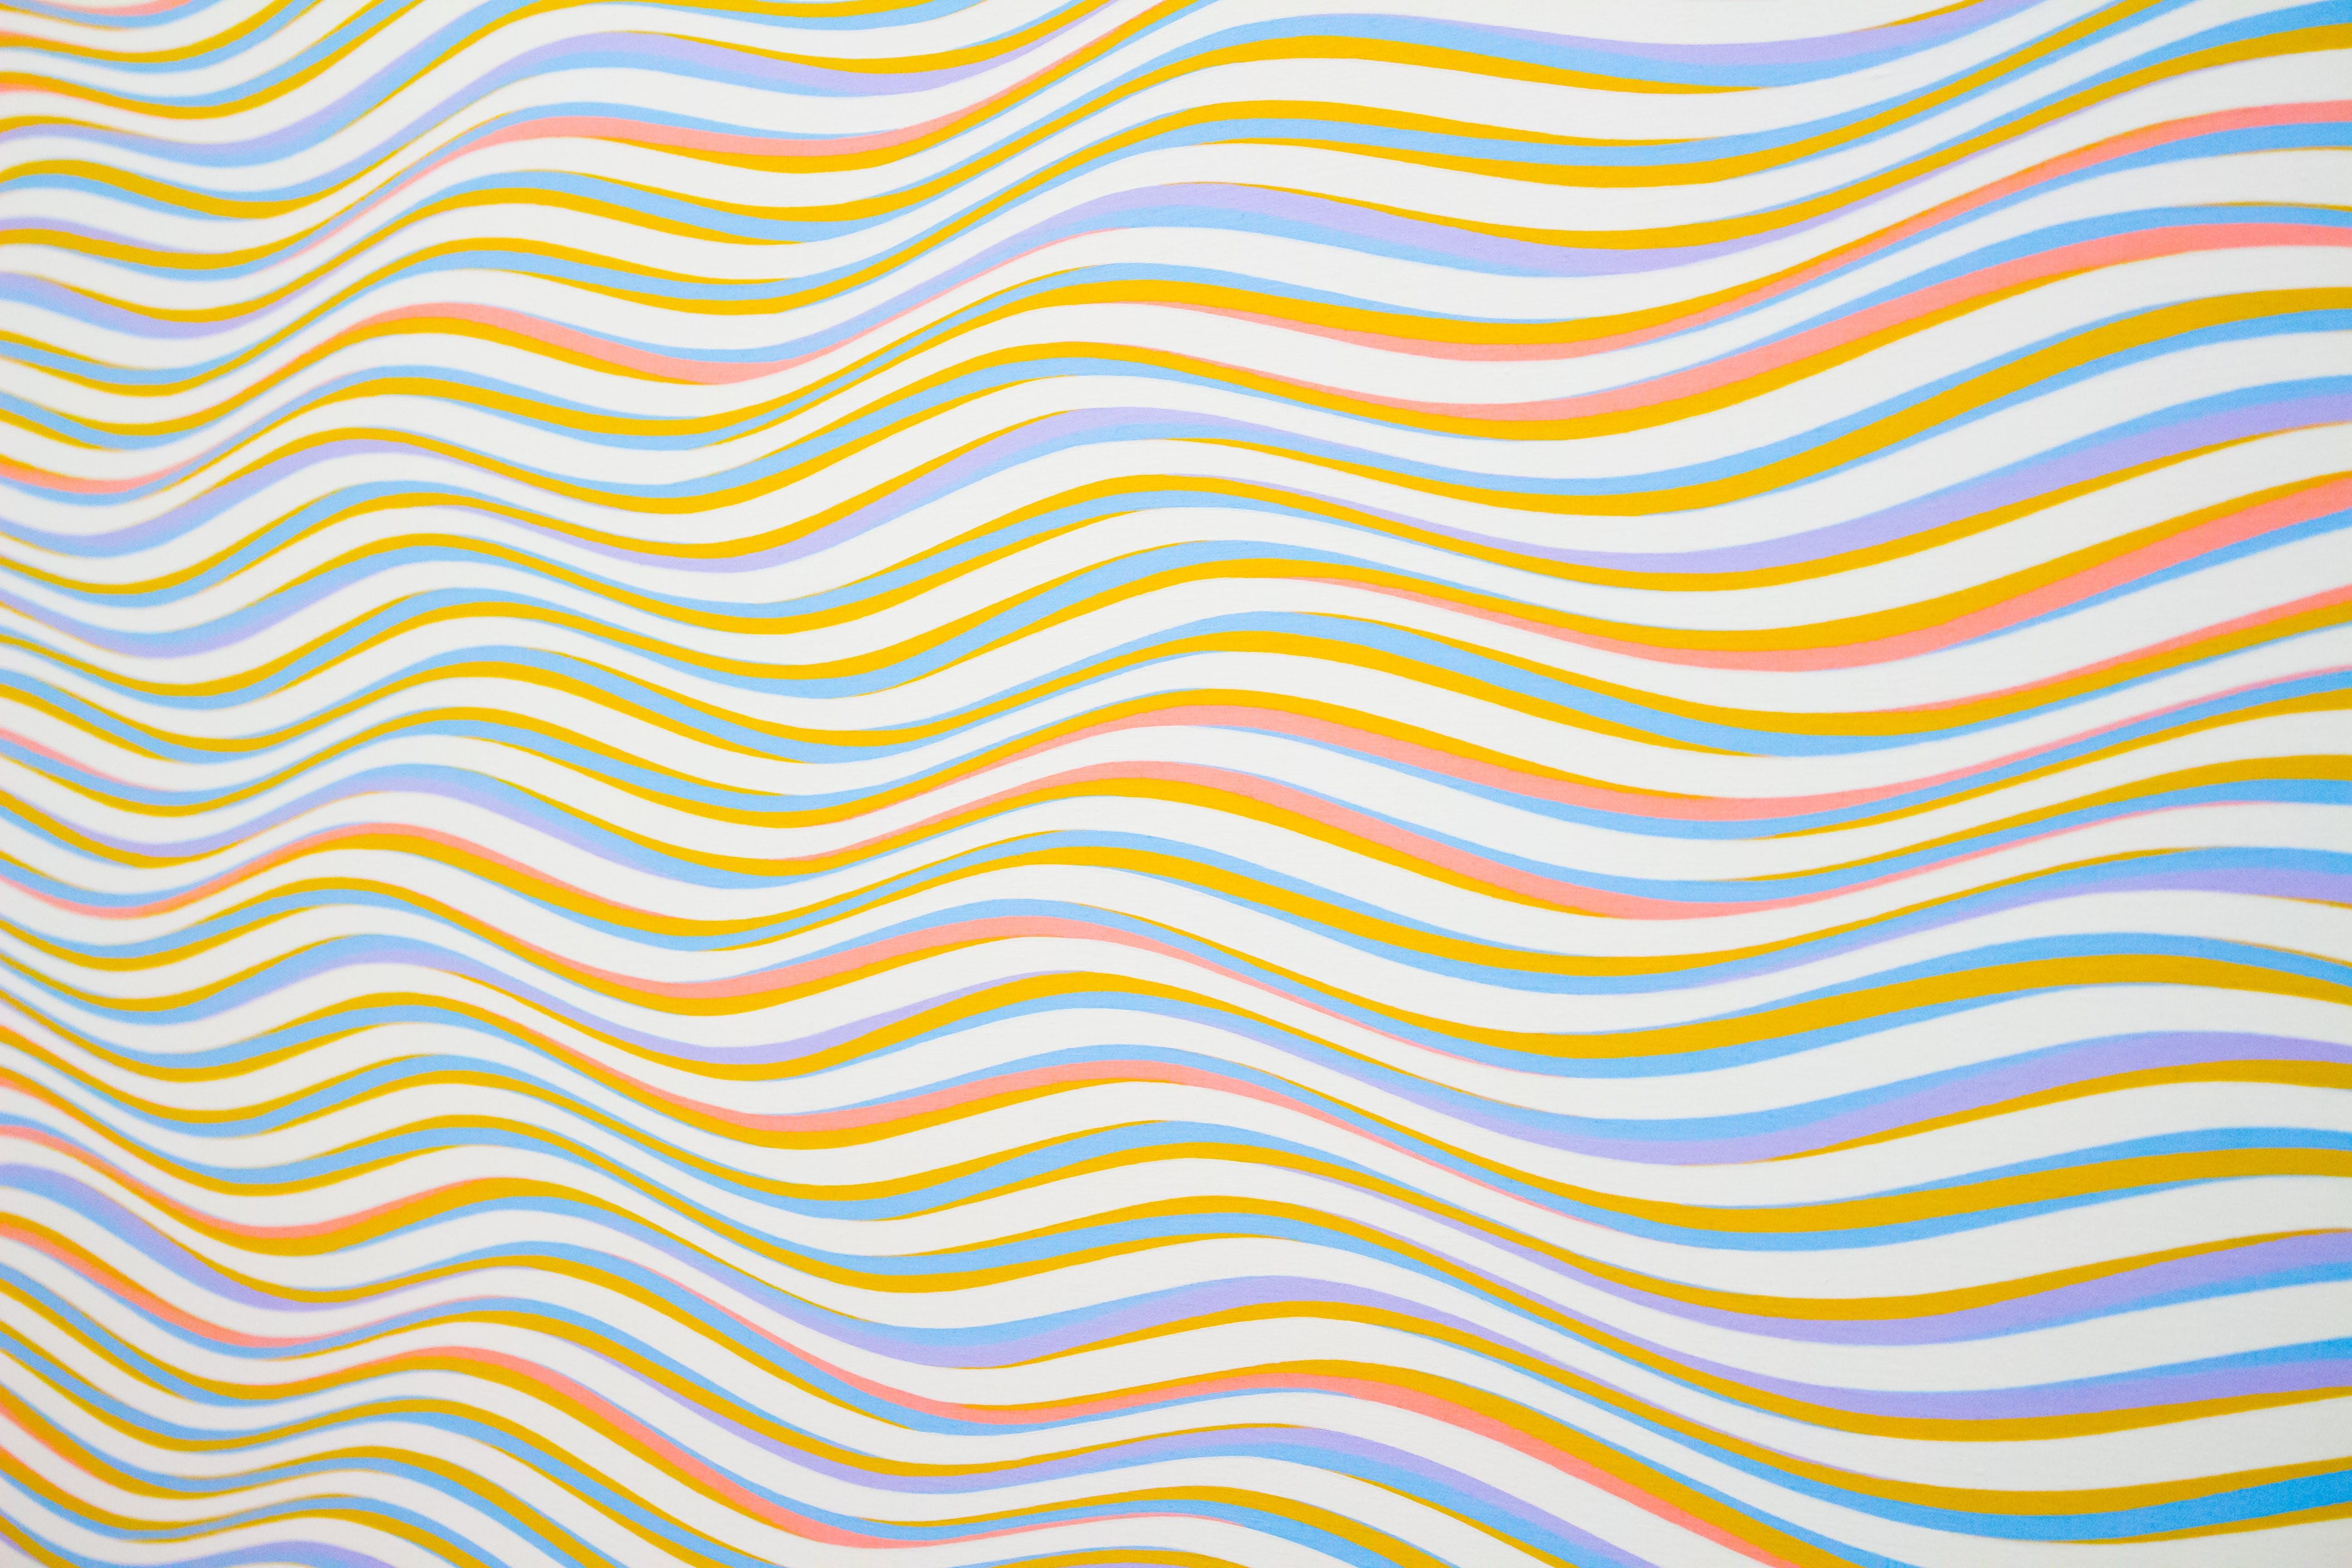 Assorted-color Striped Illustration